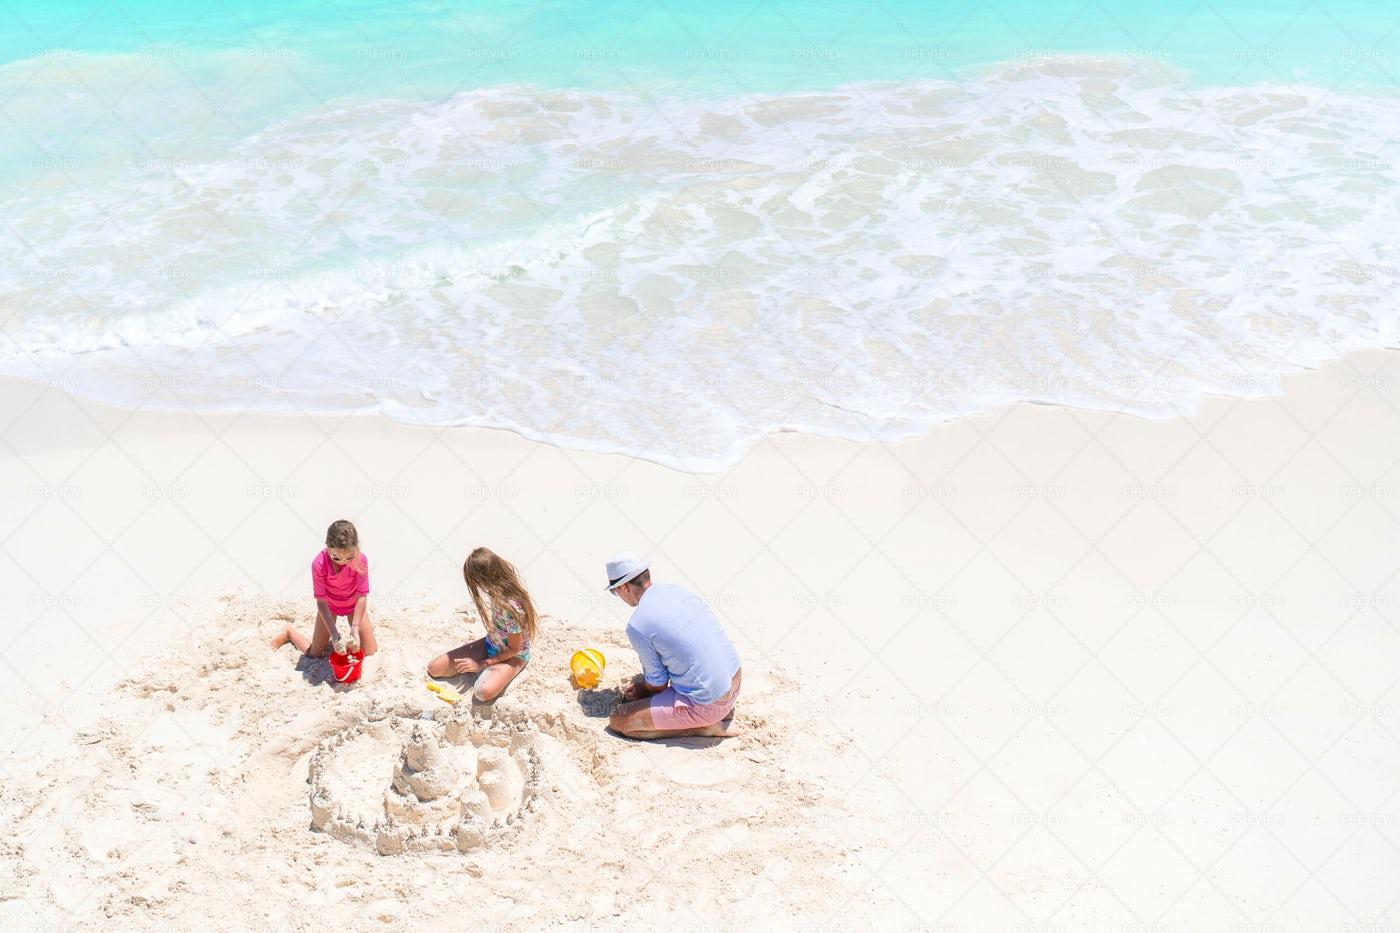 Family Building Sand Castles: Stock Photos